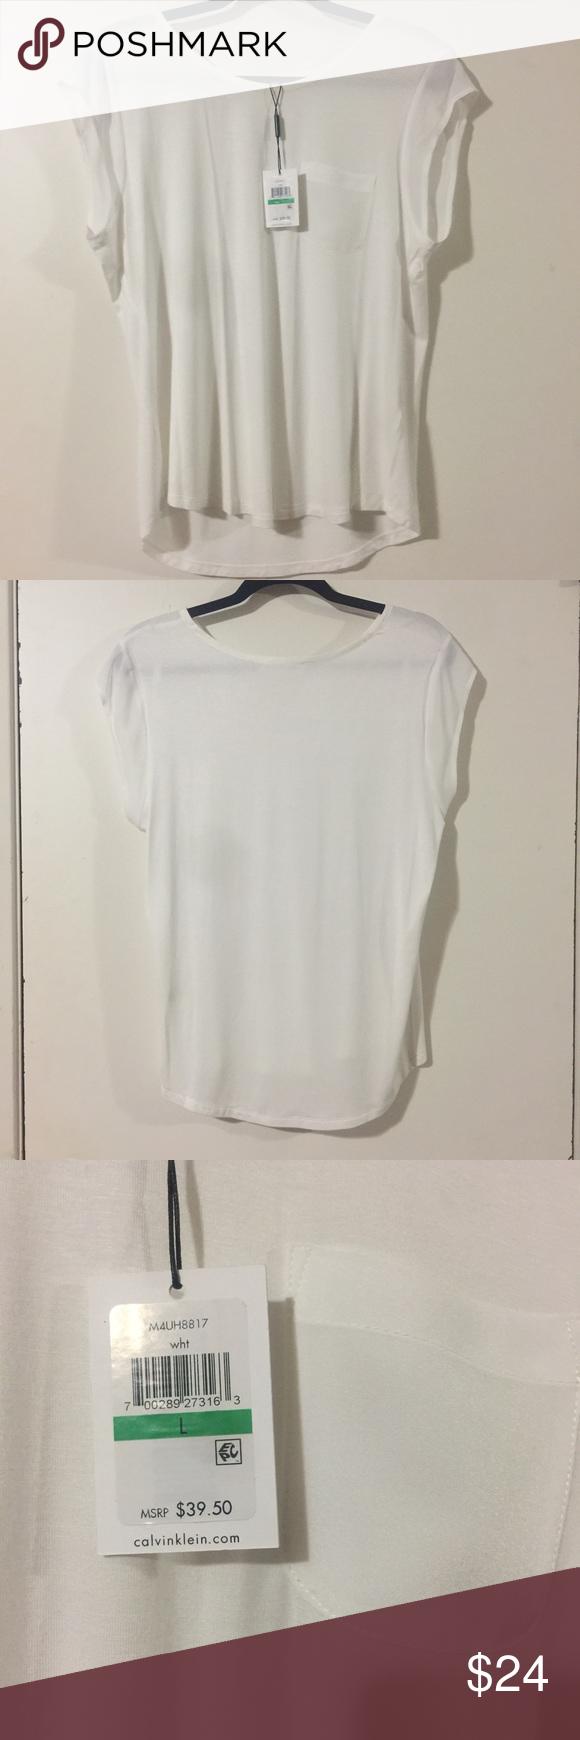 NWT - White Calvin Klein Top (L) Super soft NWT Calvin Klein top with pocket.  A closet staple for your spring wardrobe!!! Calvin Klein Tops Tees - Short Sleeve